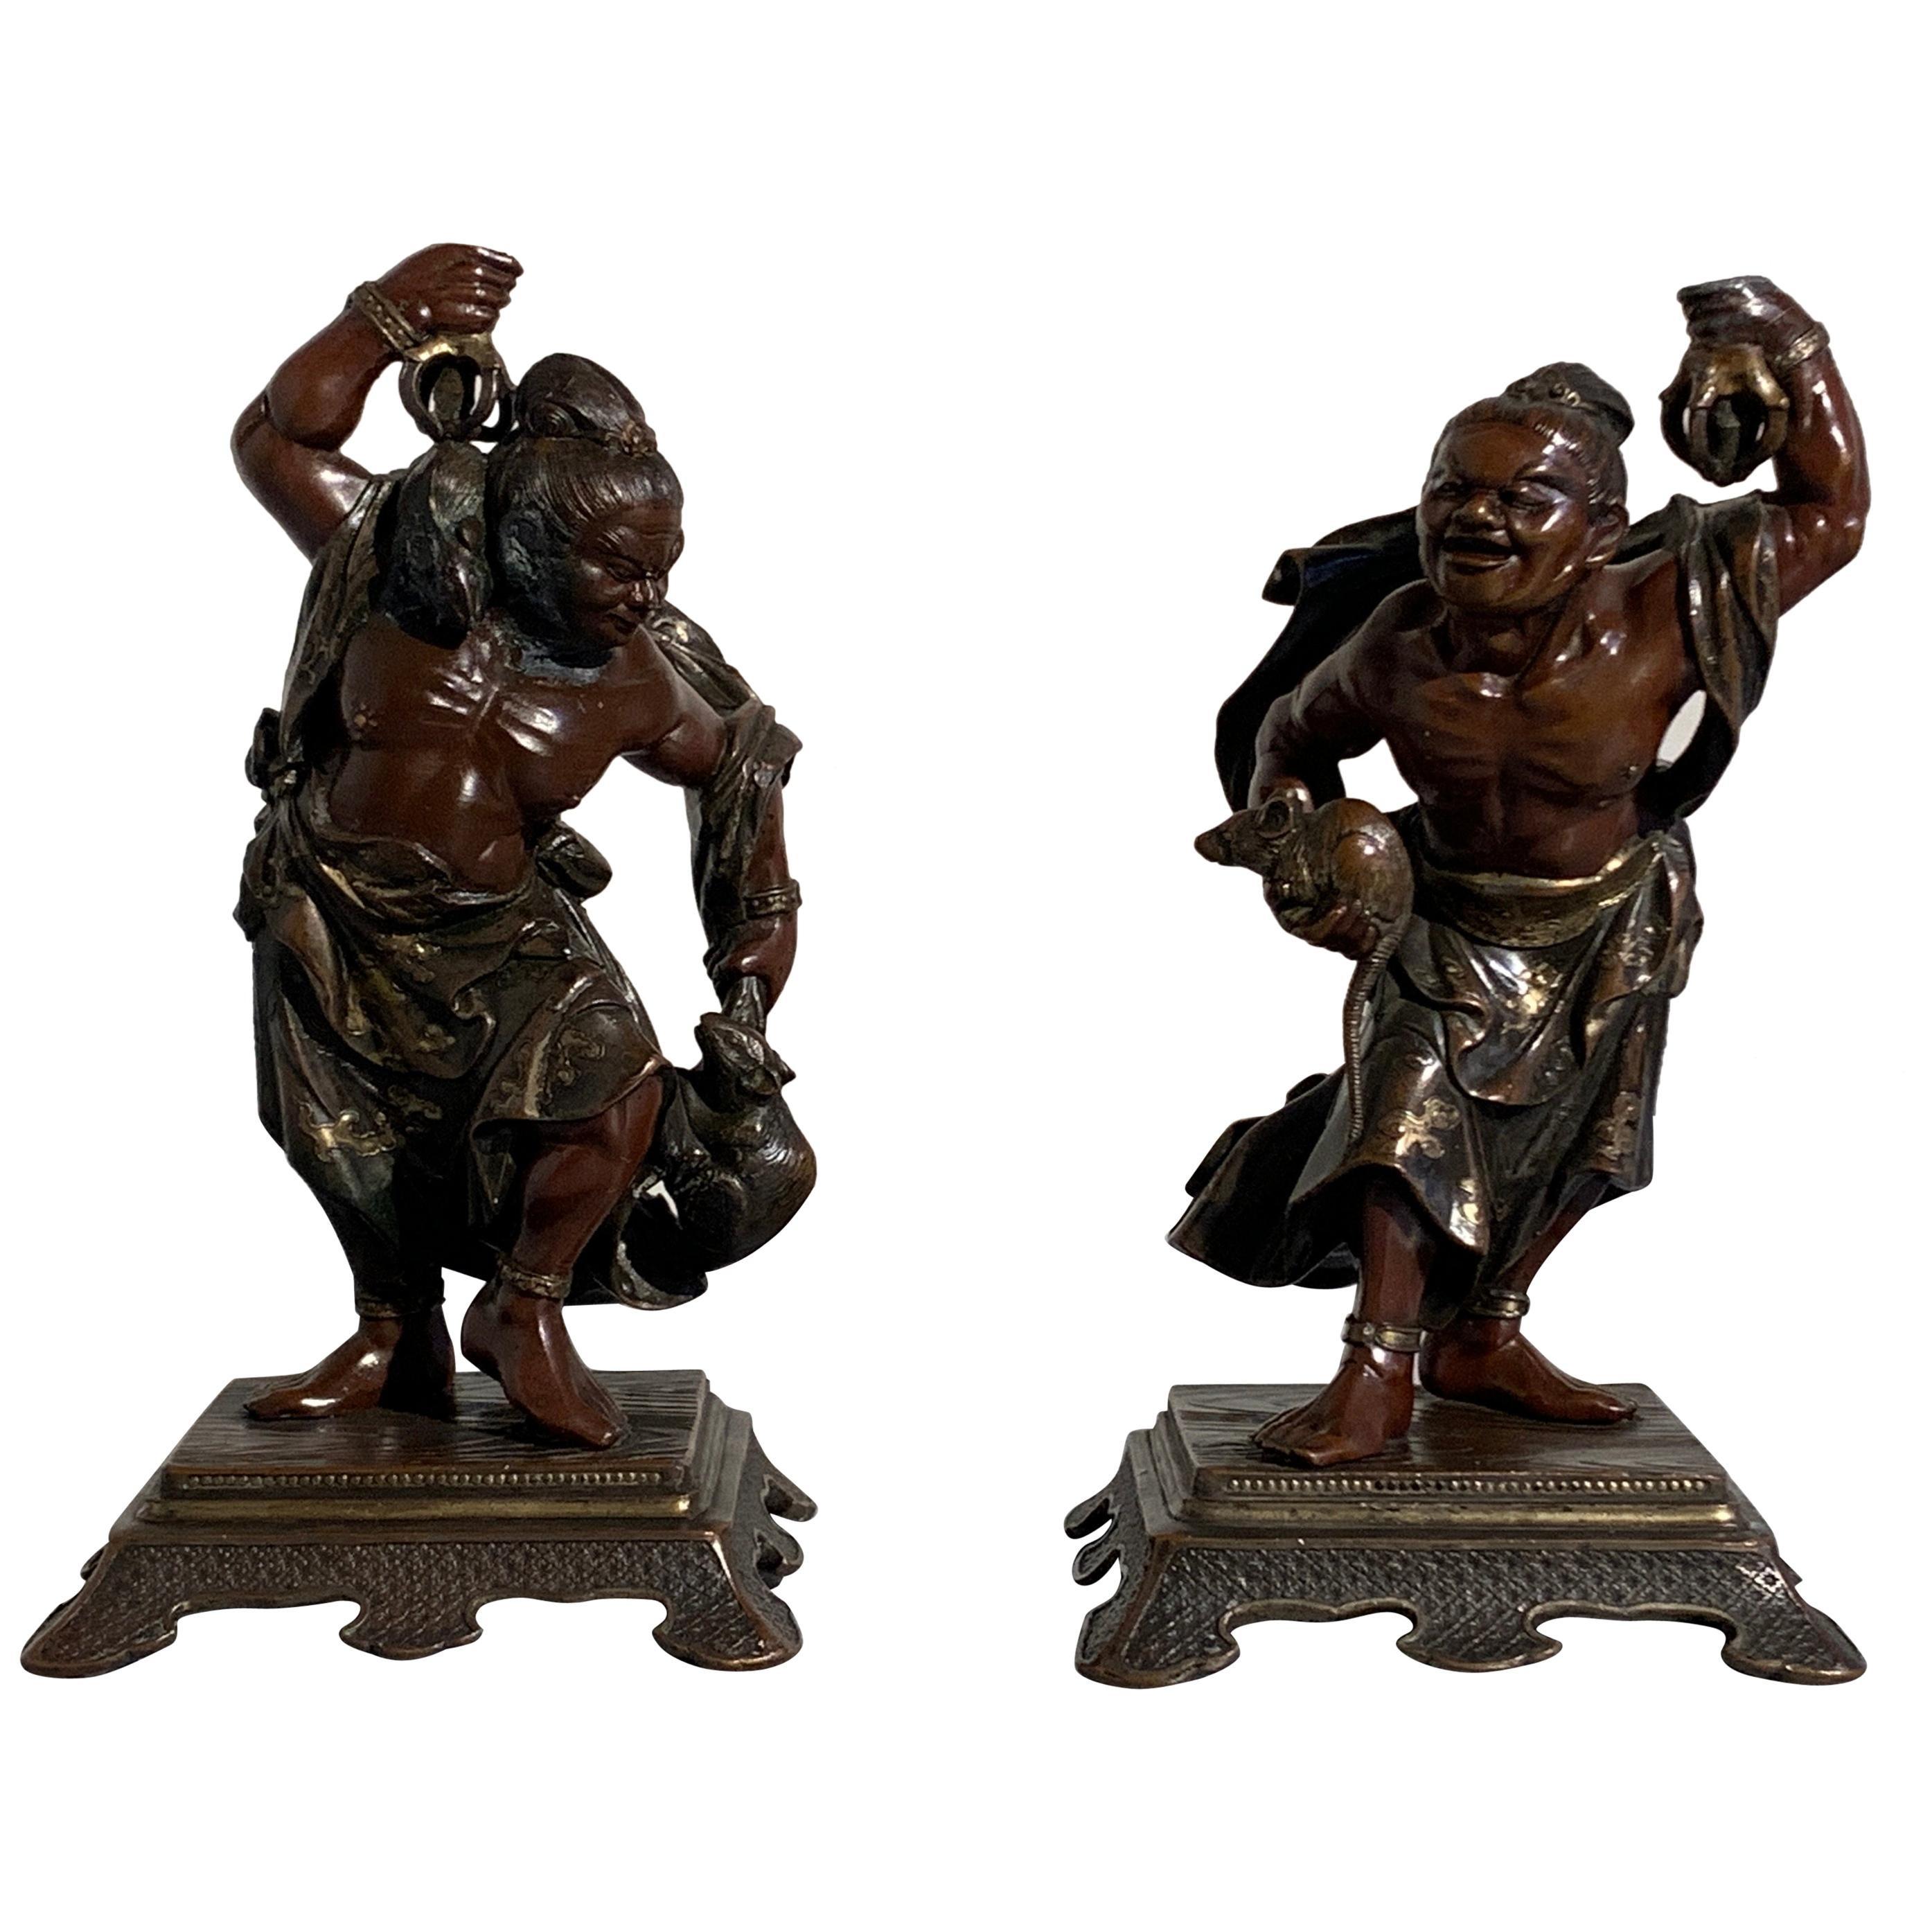 Pair of Japanese Cast Bronze Figures of Niō, Meiji Period, Late 19th Century